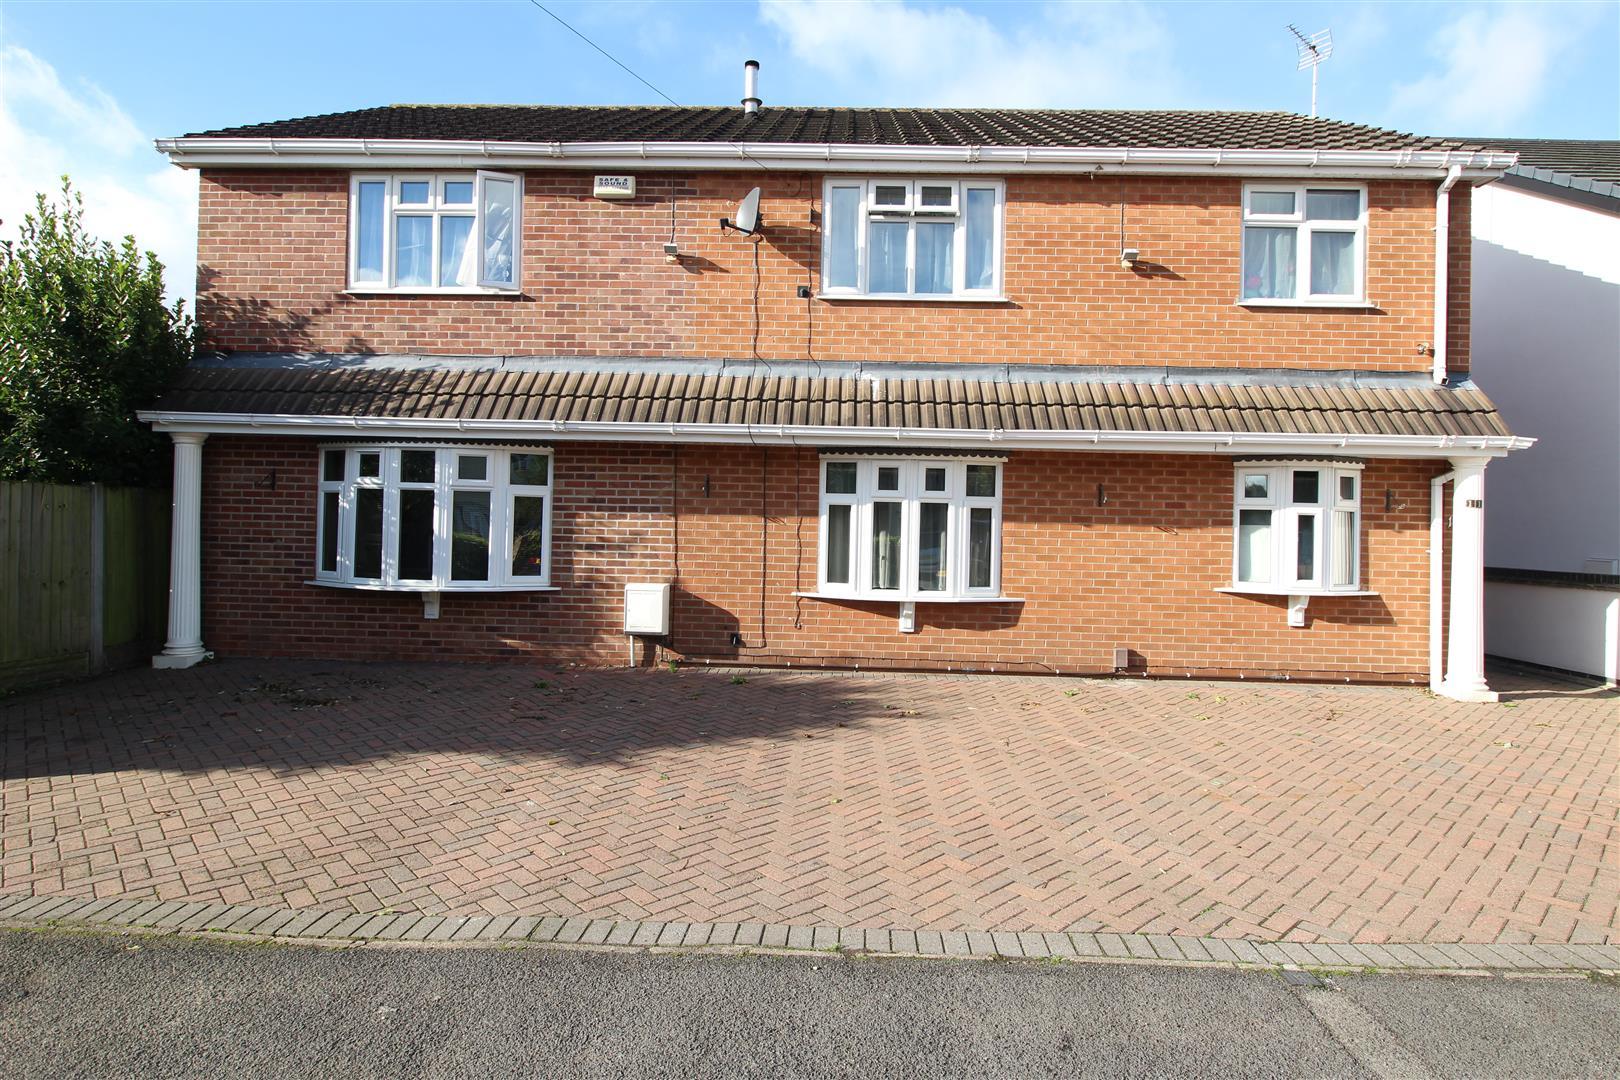 5 Bedrooms House for sale in Beech Avenue, Sandiacre, Nottingham